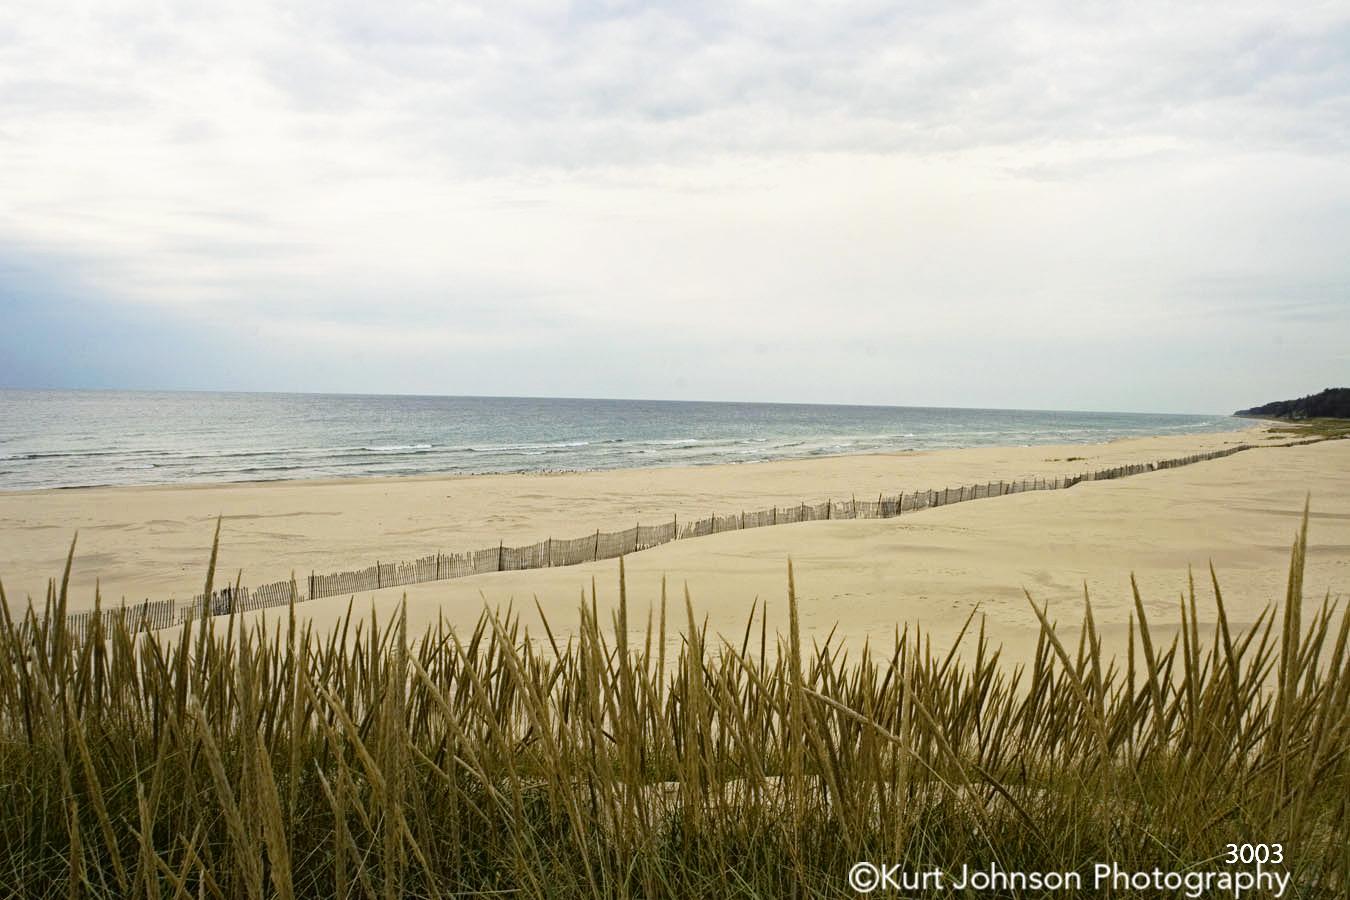 sand beach ocean green grass shoreline blue water sky clouds waterscape